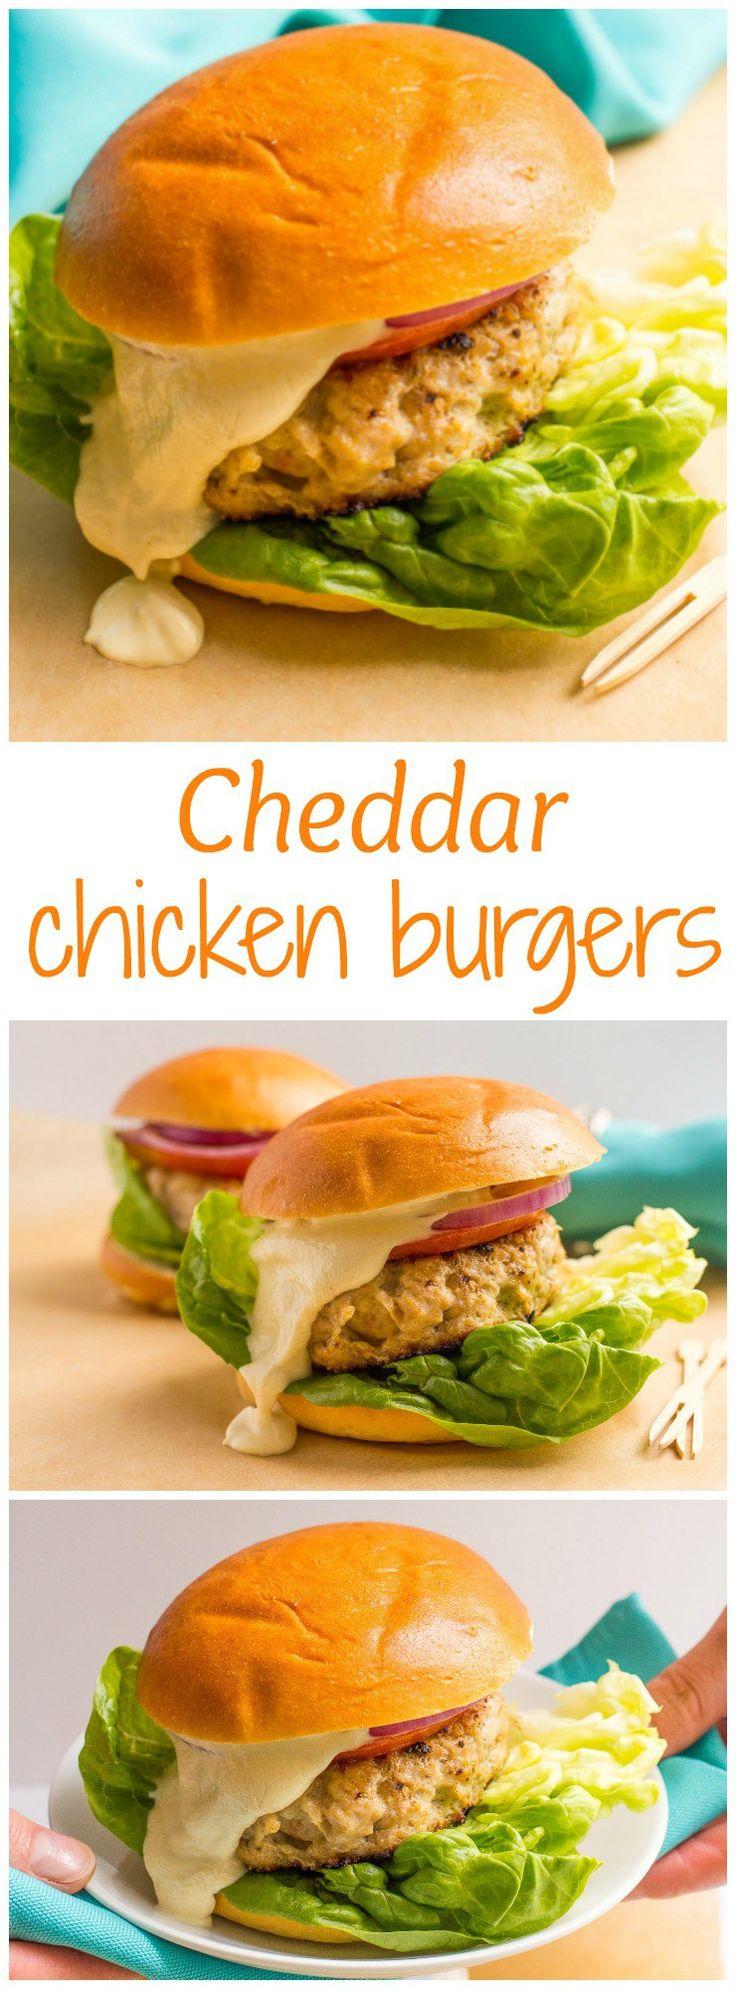 how to make chicken burgers with ground chicken